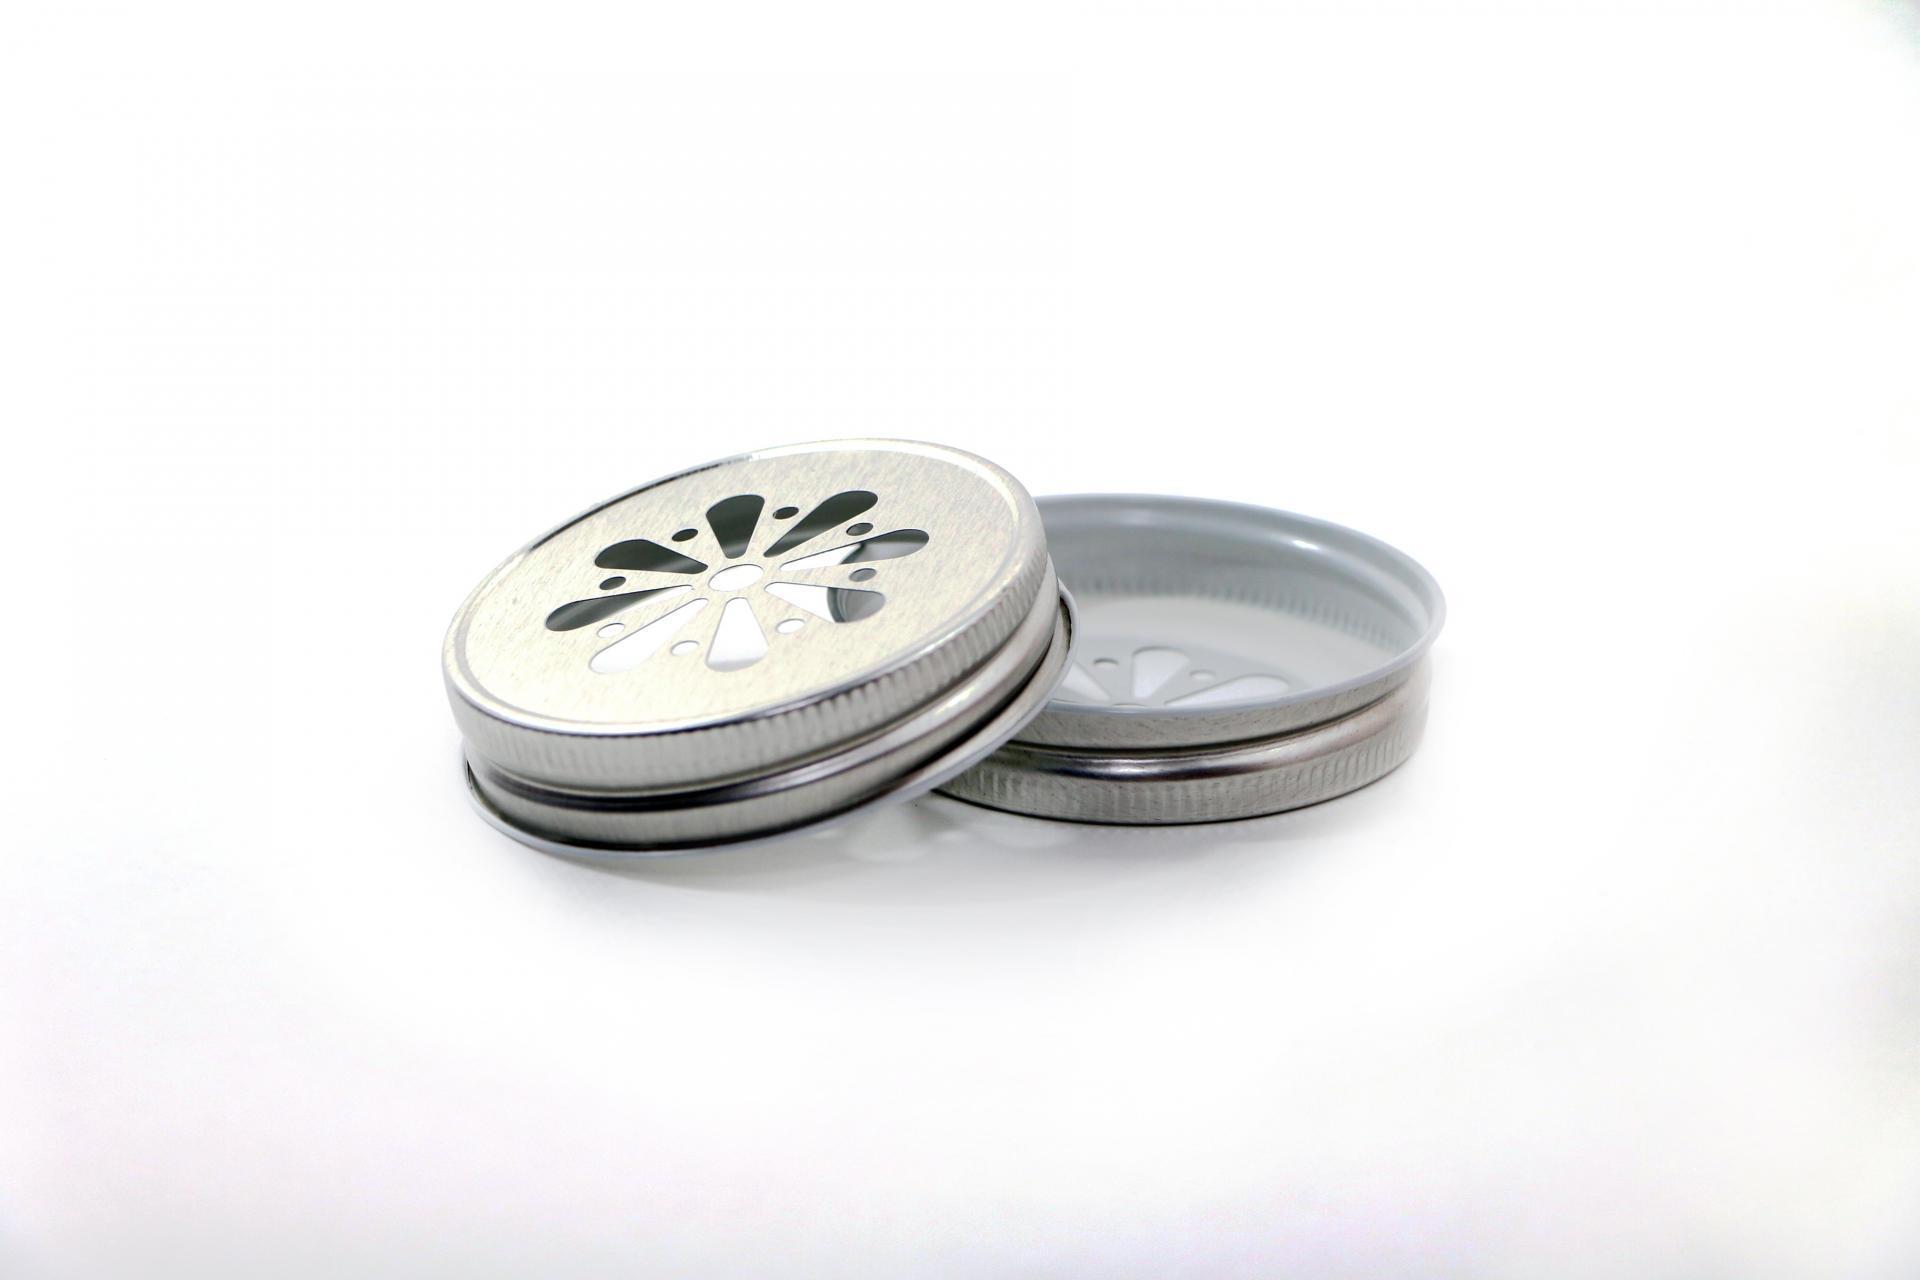 Ball Dekorativní kovové víčko Ball stříbrné, stříbrná barva, kov